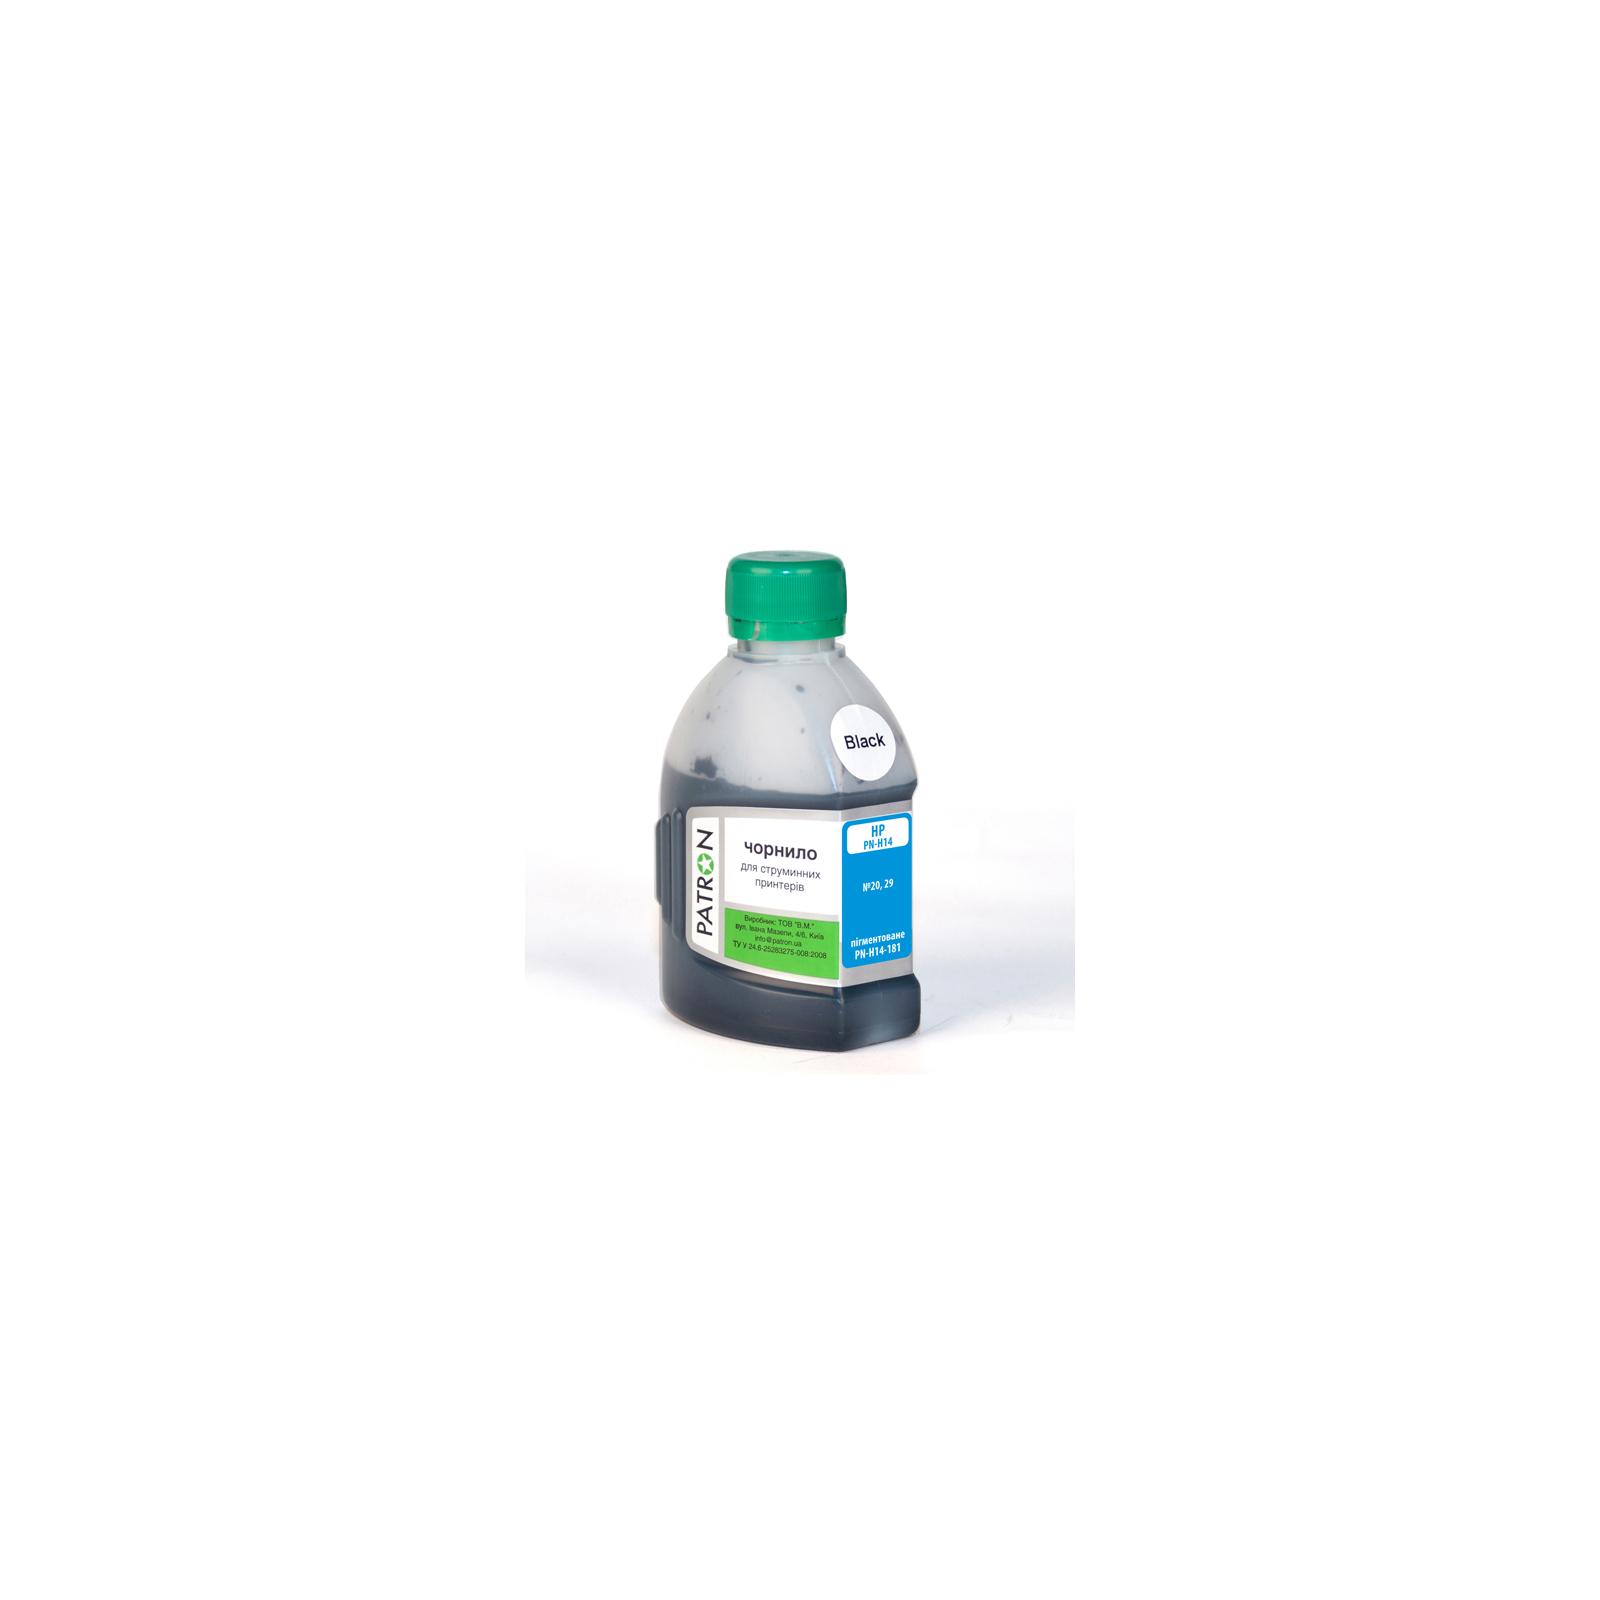 Чернила PATRON HP №20/29 BLACKpigment/180 г (I-PN-H14-180-B-P)